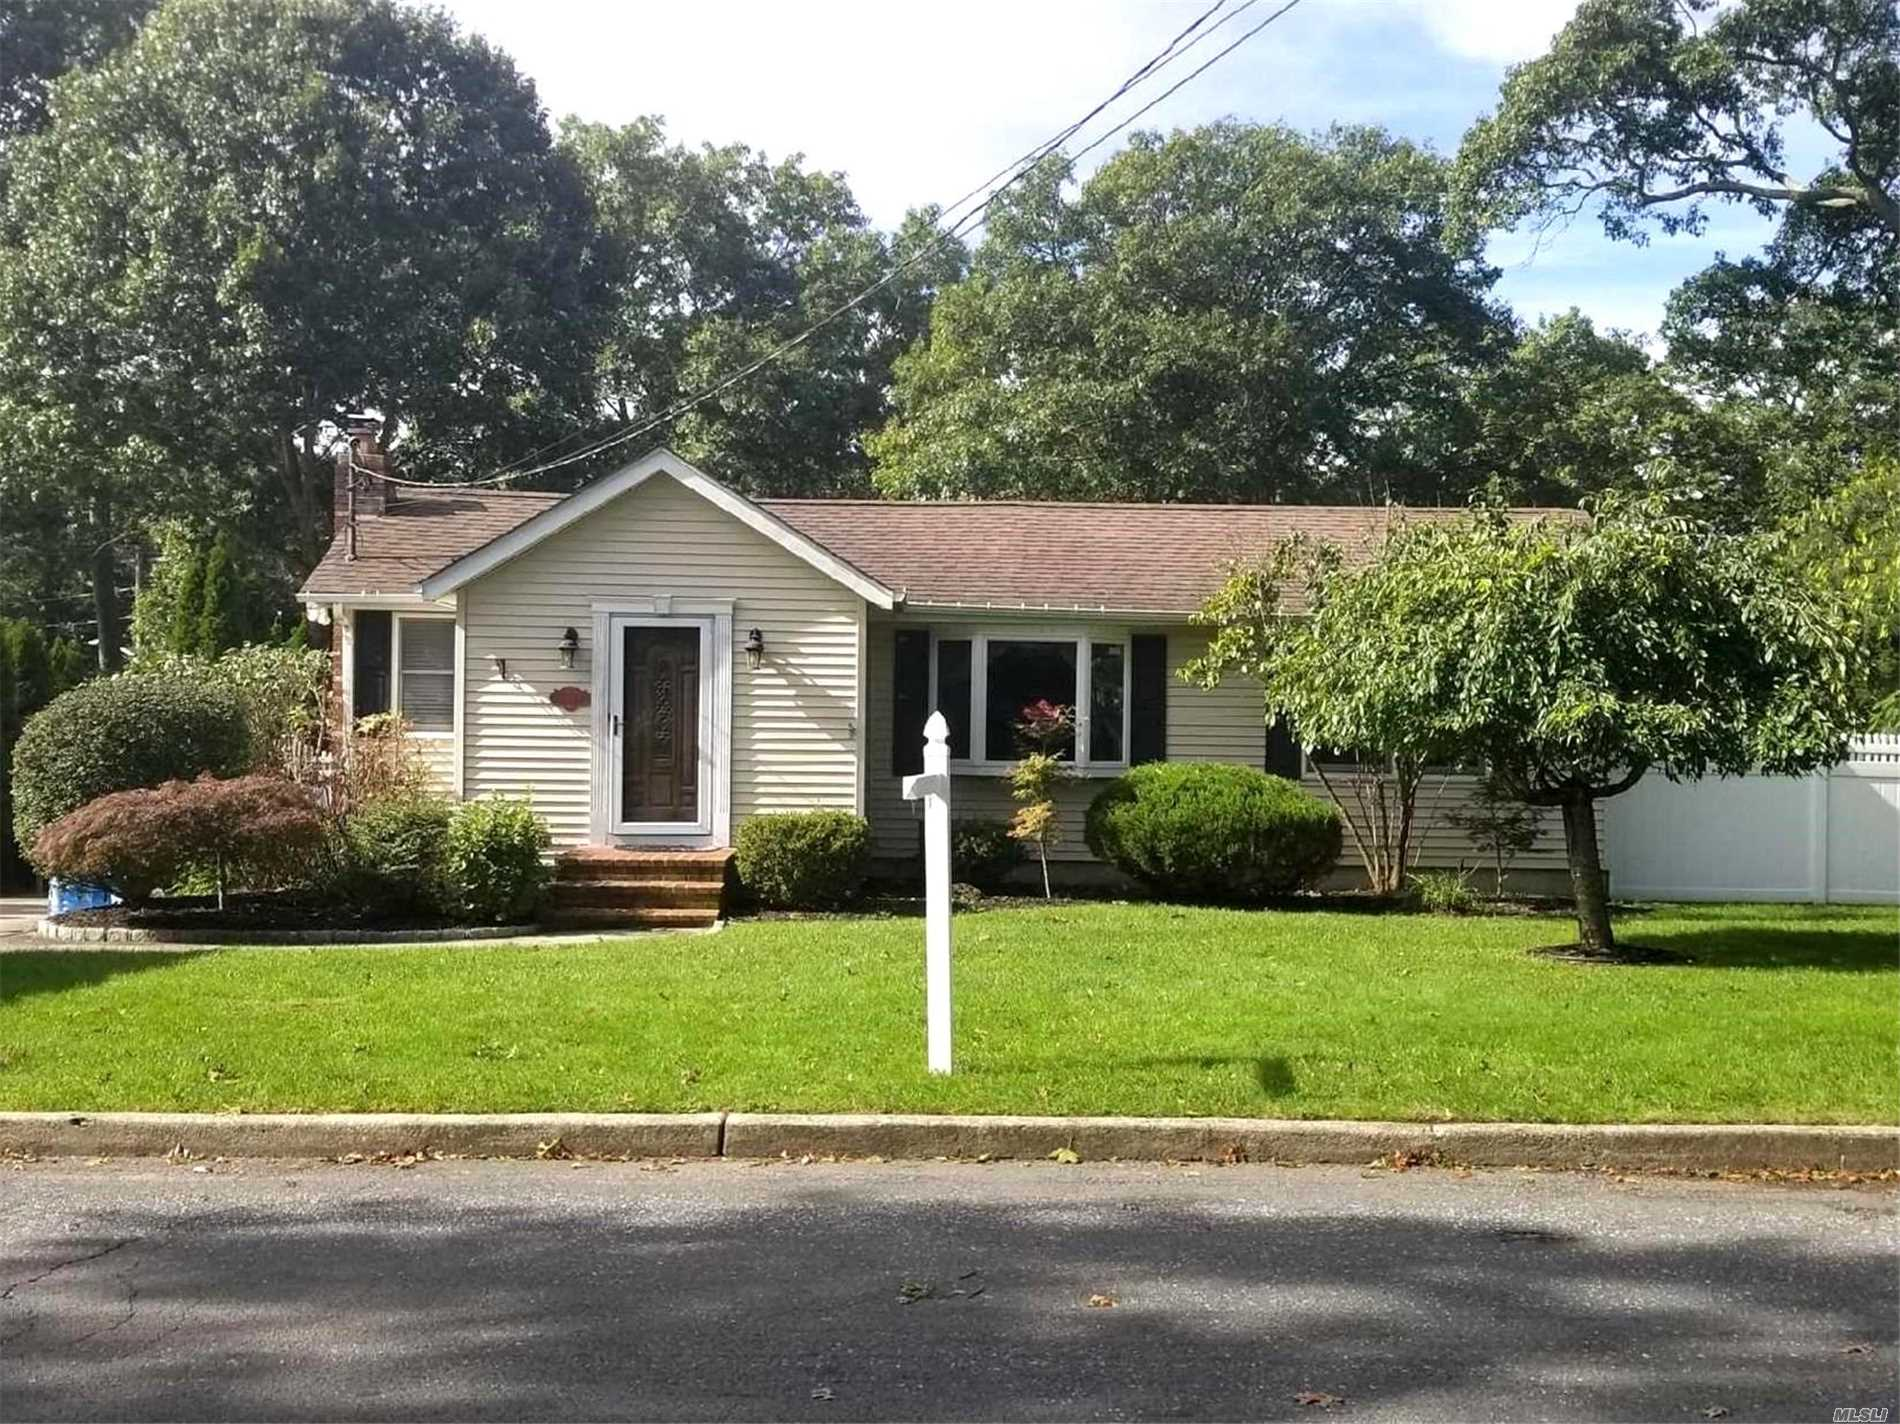 Photo of home for sale at 54 Seawanhaka Ave, Nesconset NY